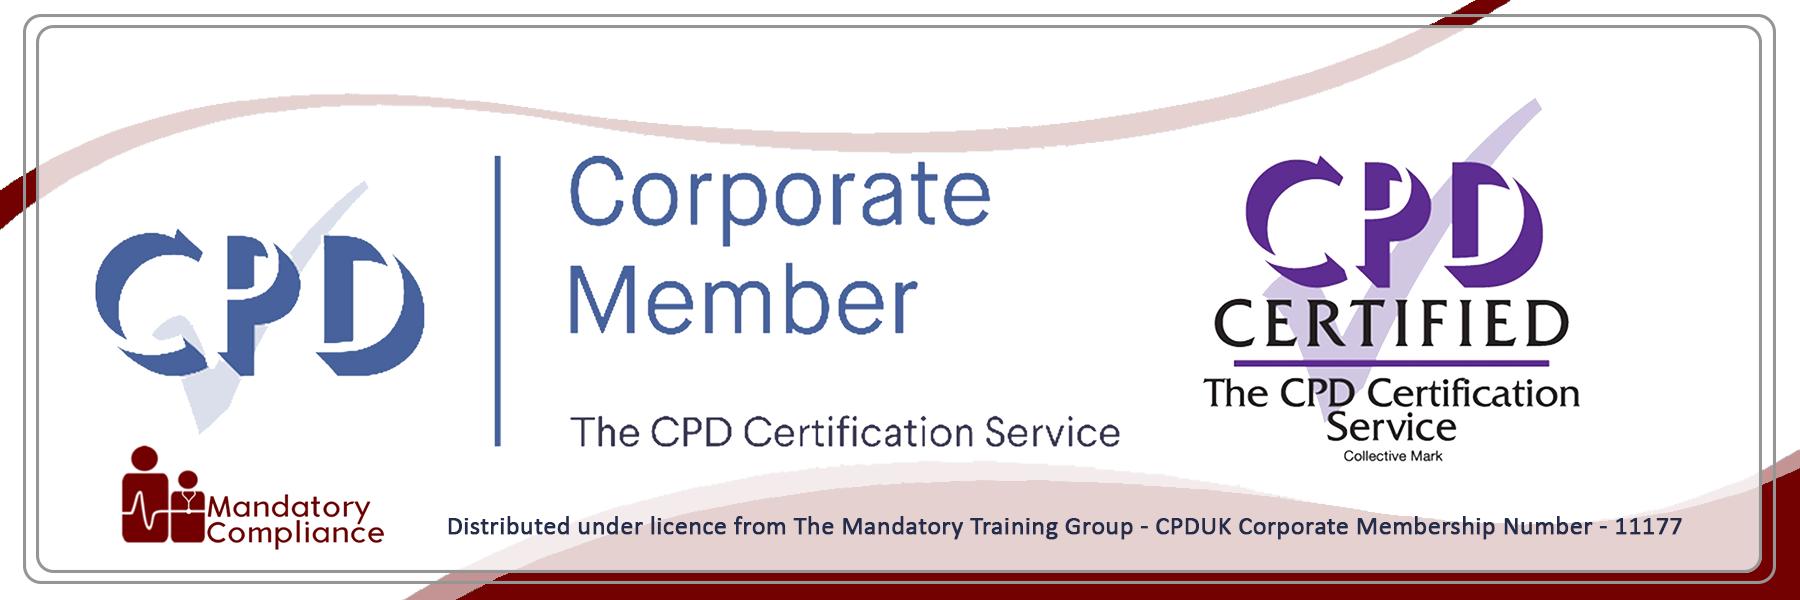 Mastering MS Powerpoint 2016 -Online Training Course - The Mandatory Training Group UK -